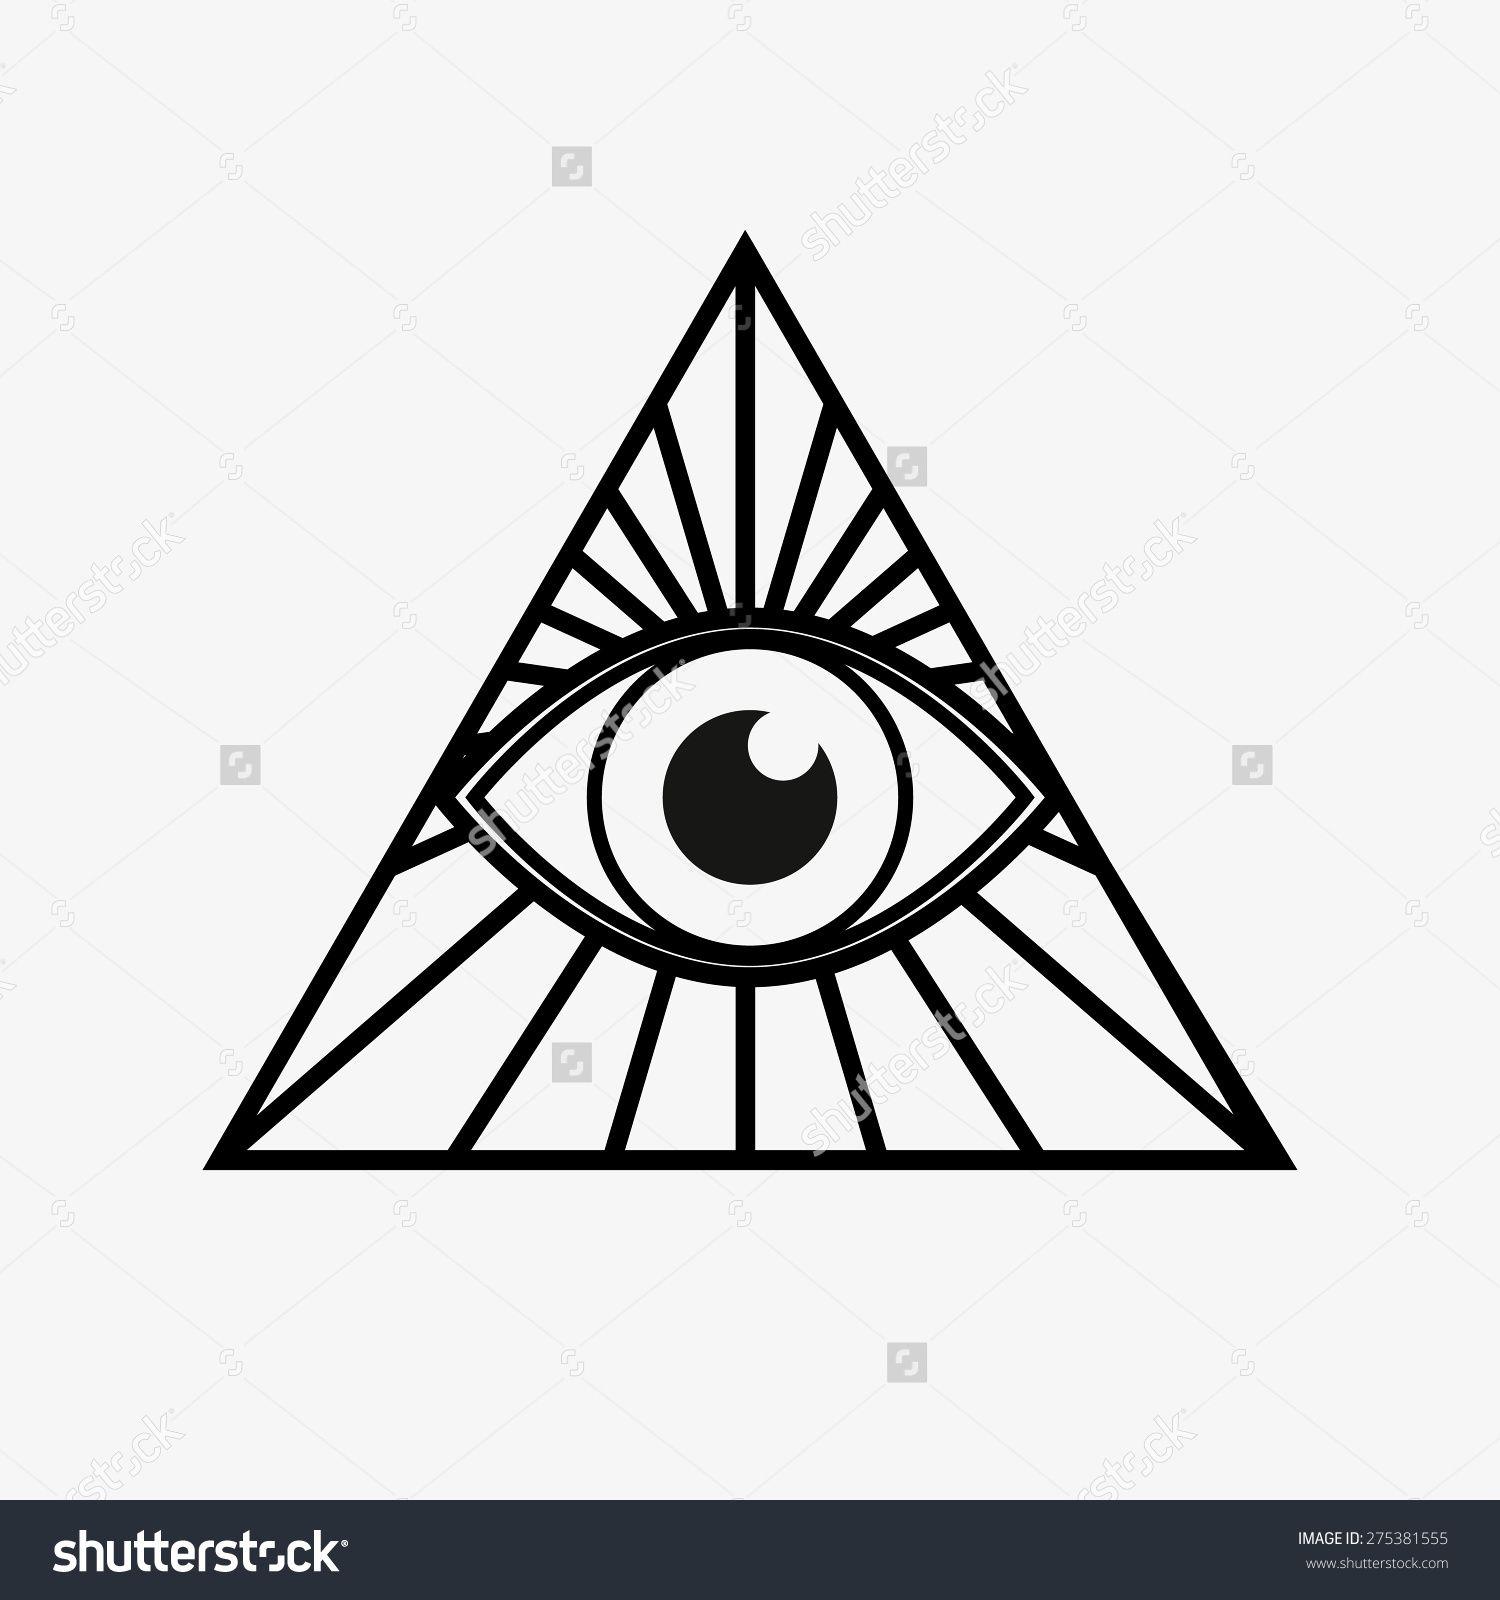 Image result for eye triangle Basic tattoos, Eye tattoo